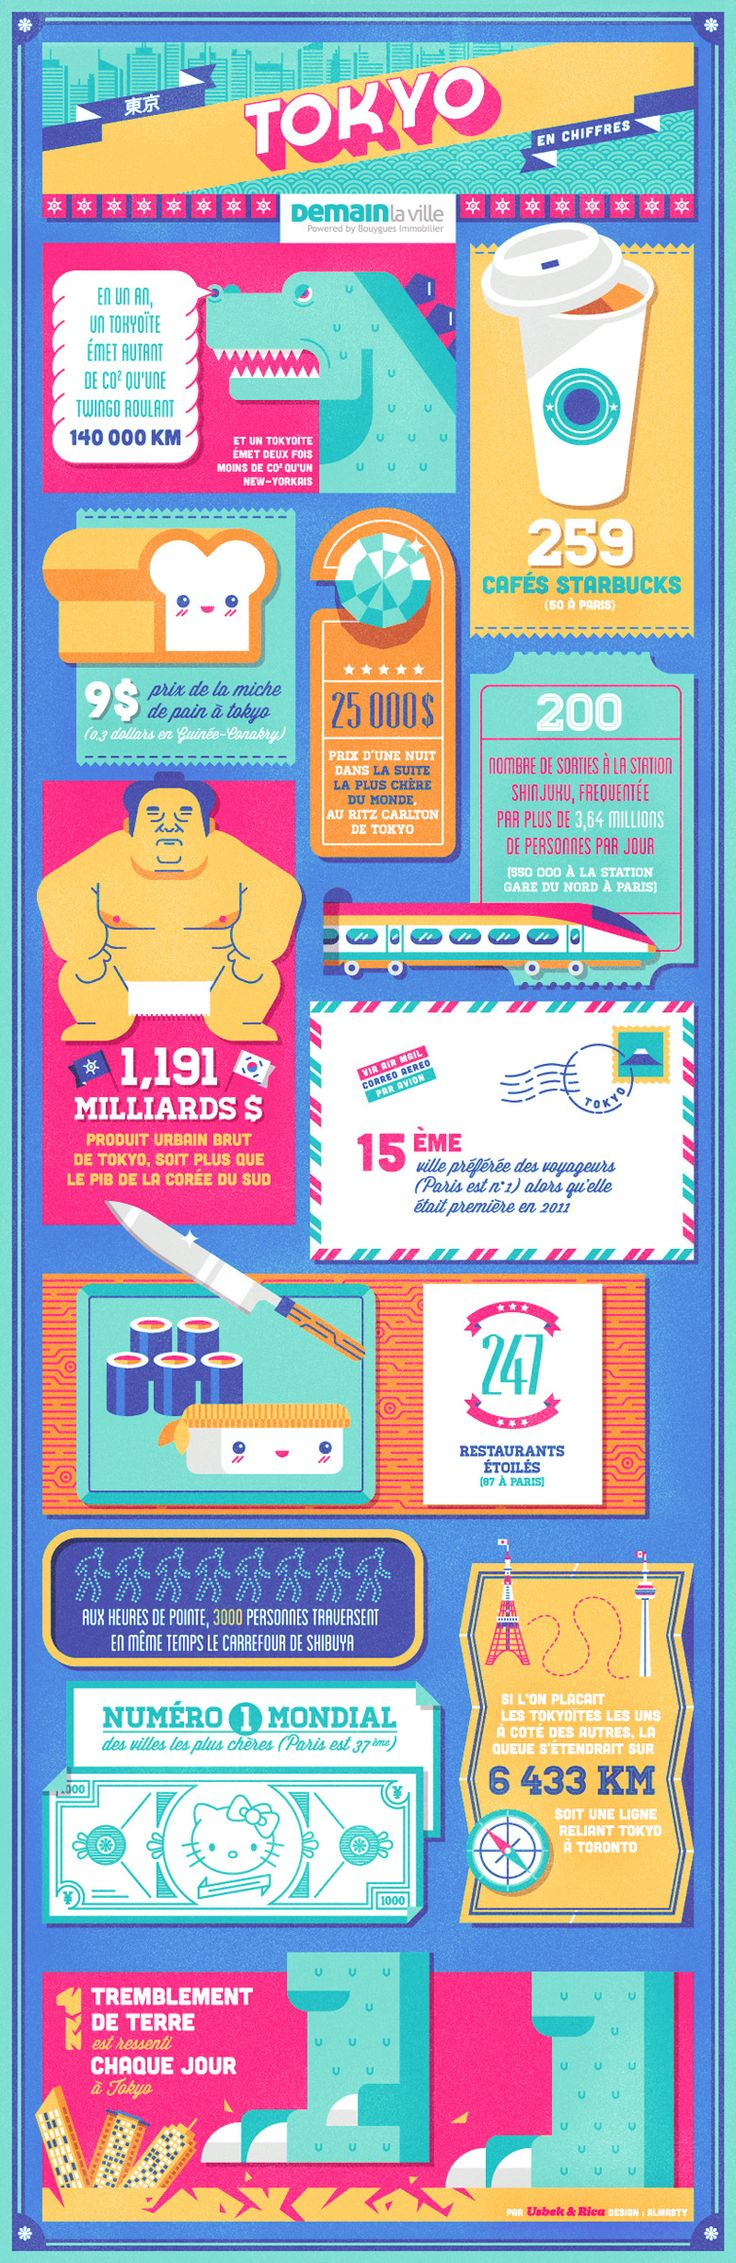 Tokyo. (More design inspiration at www.aldenchong.com) #infographic